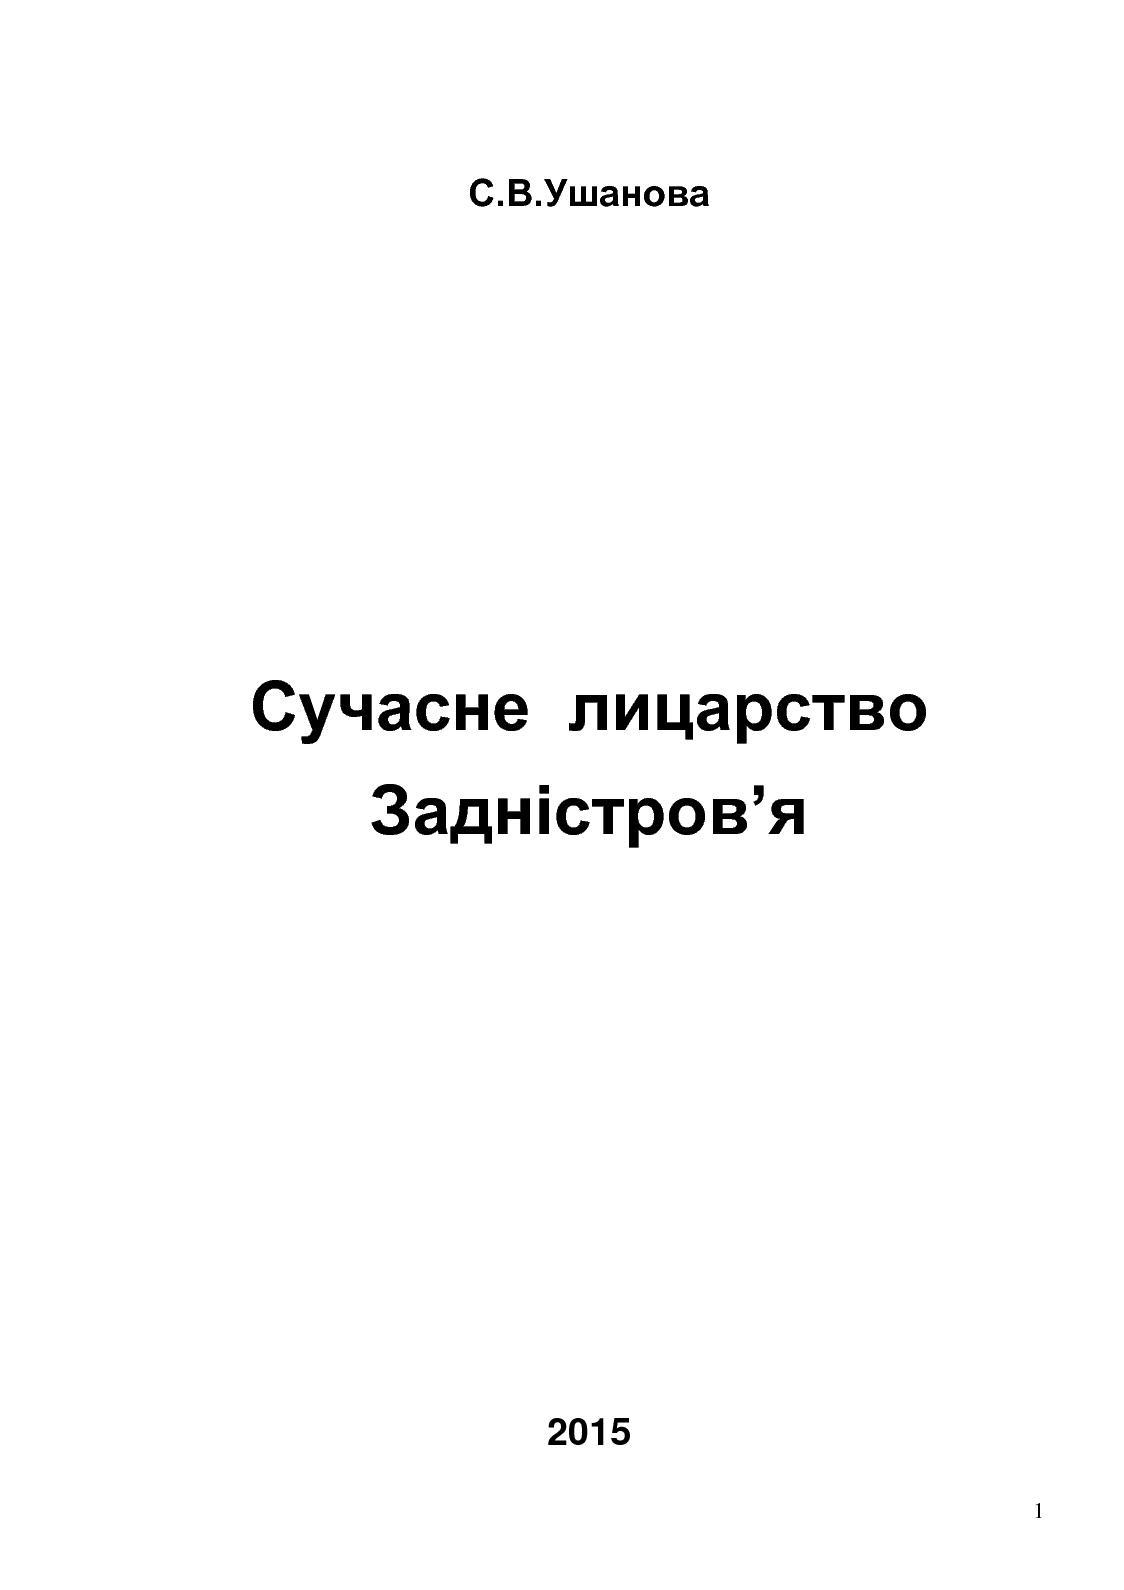 Calaméo - 03 2007 Сучасне лицарство Задністров я bfec45f0d57ed